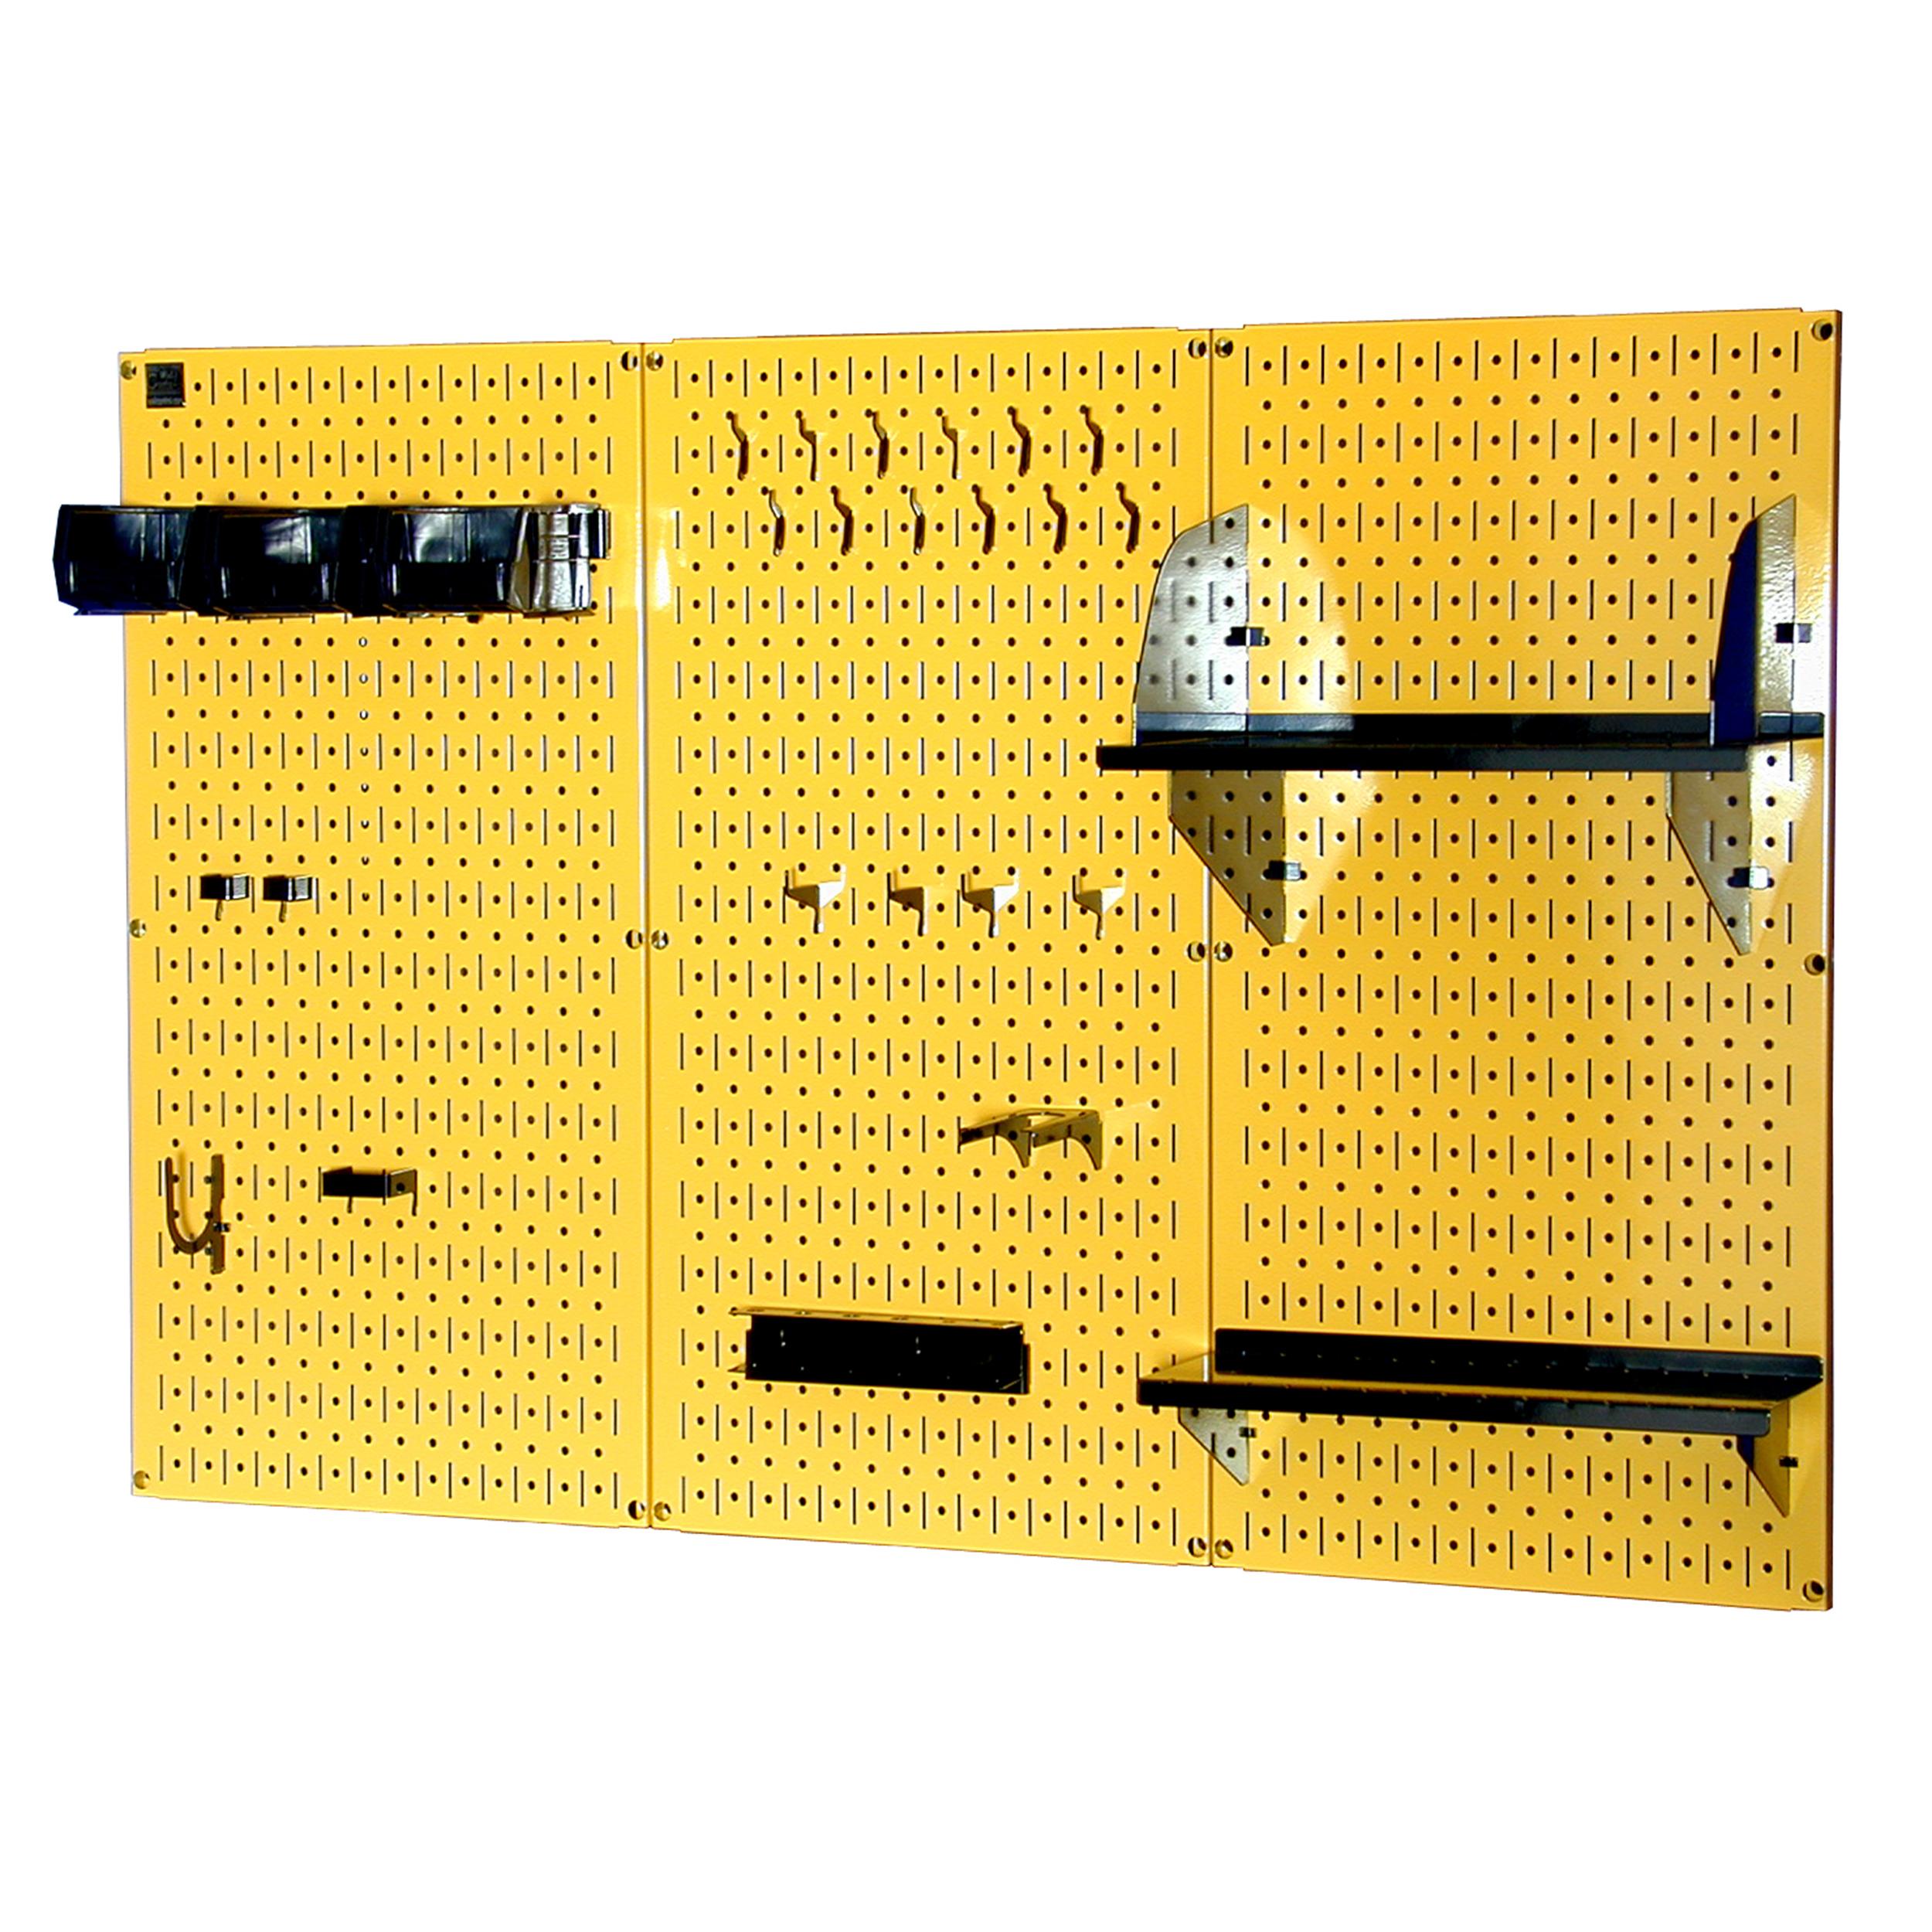 4' Metal Pegboard Standard Tool Storage Kit - Yellow Toolboard & Black Accessories